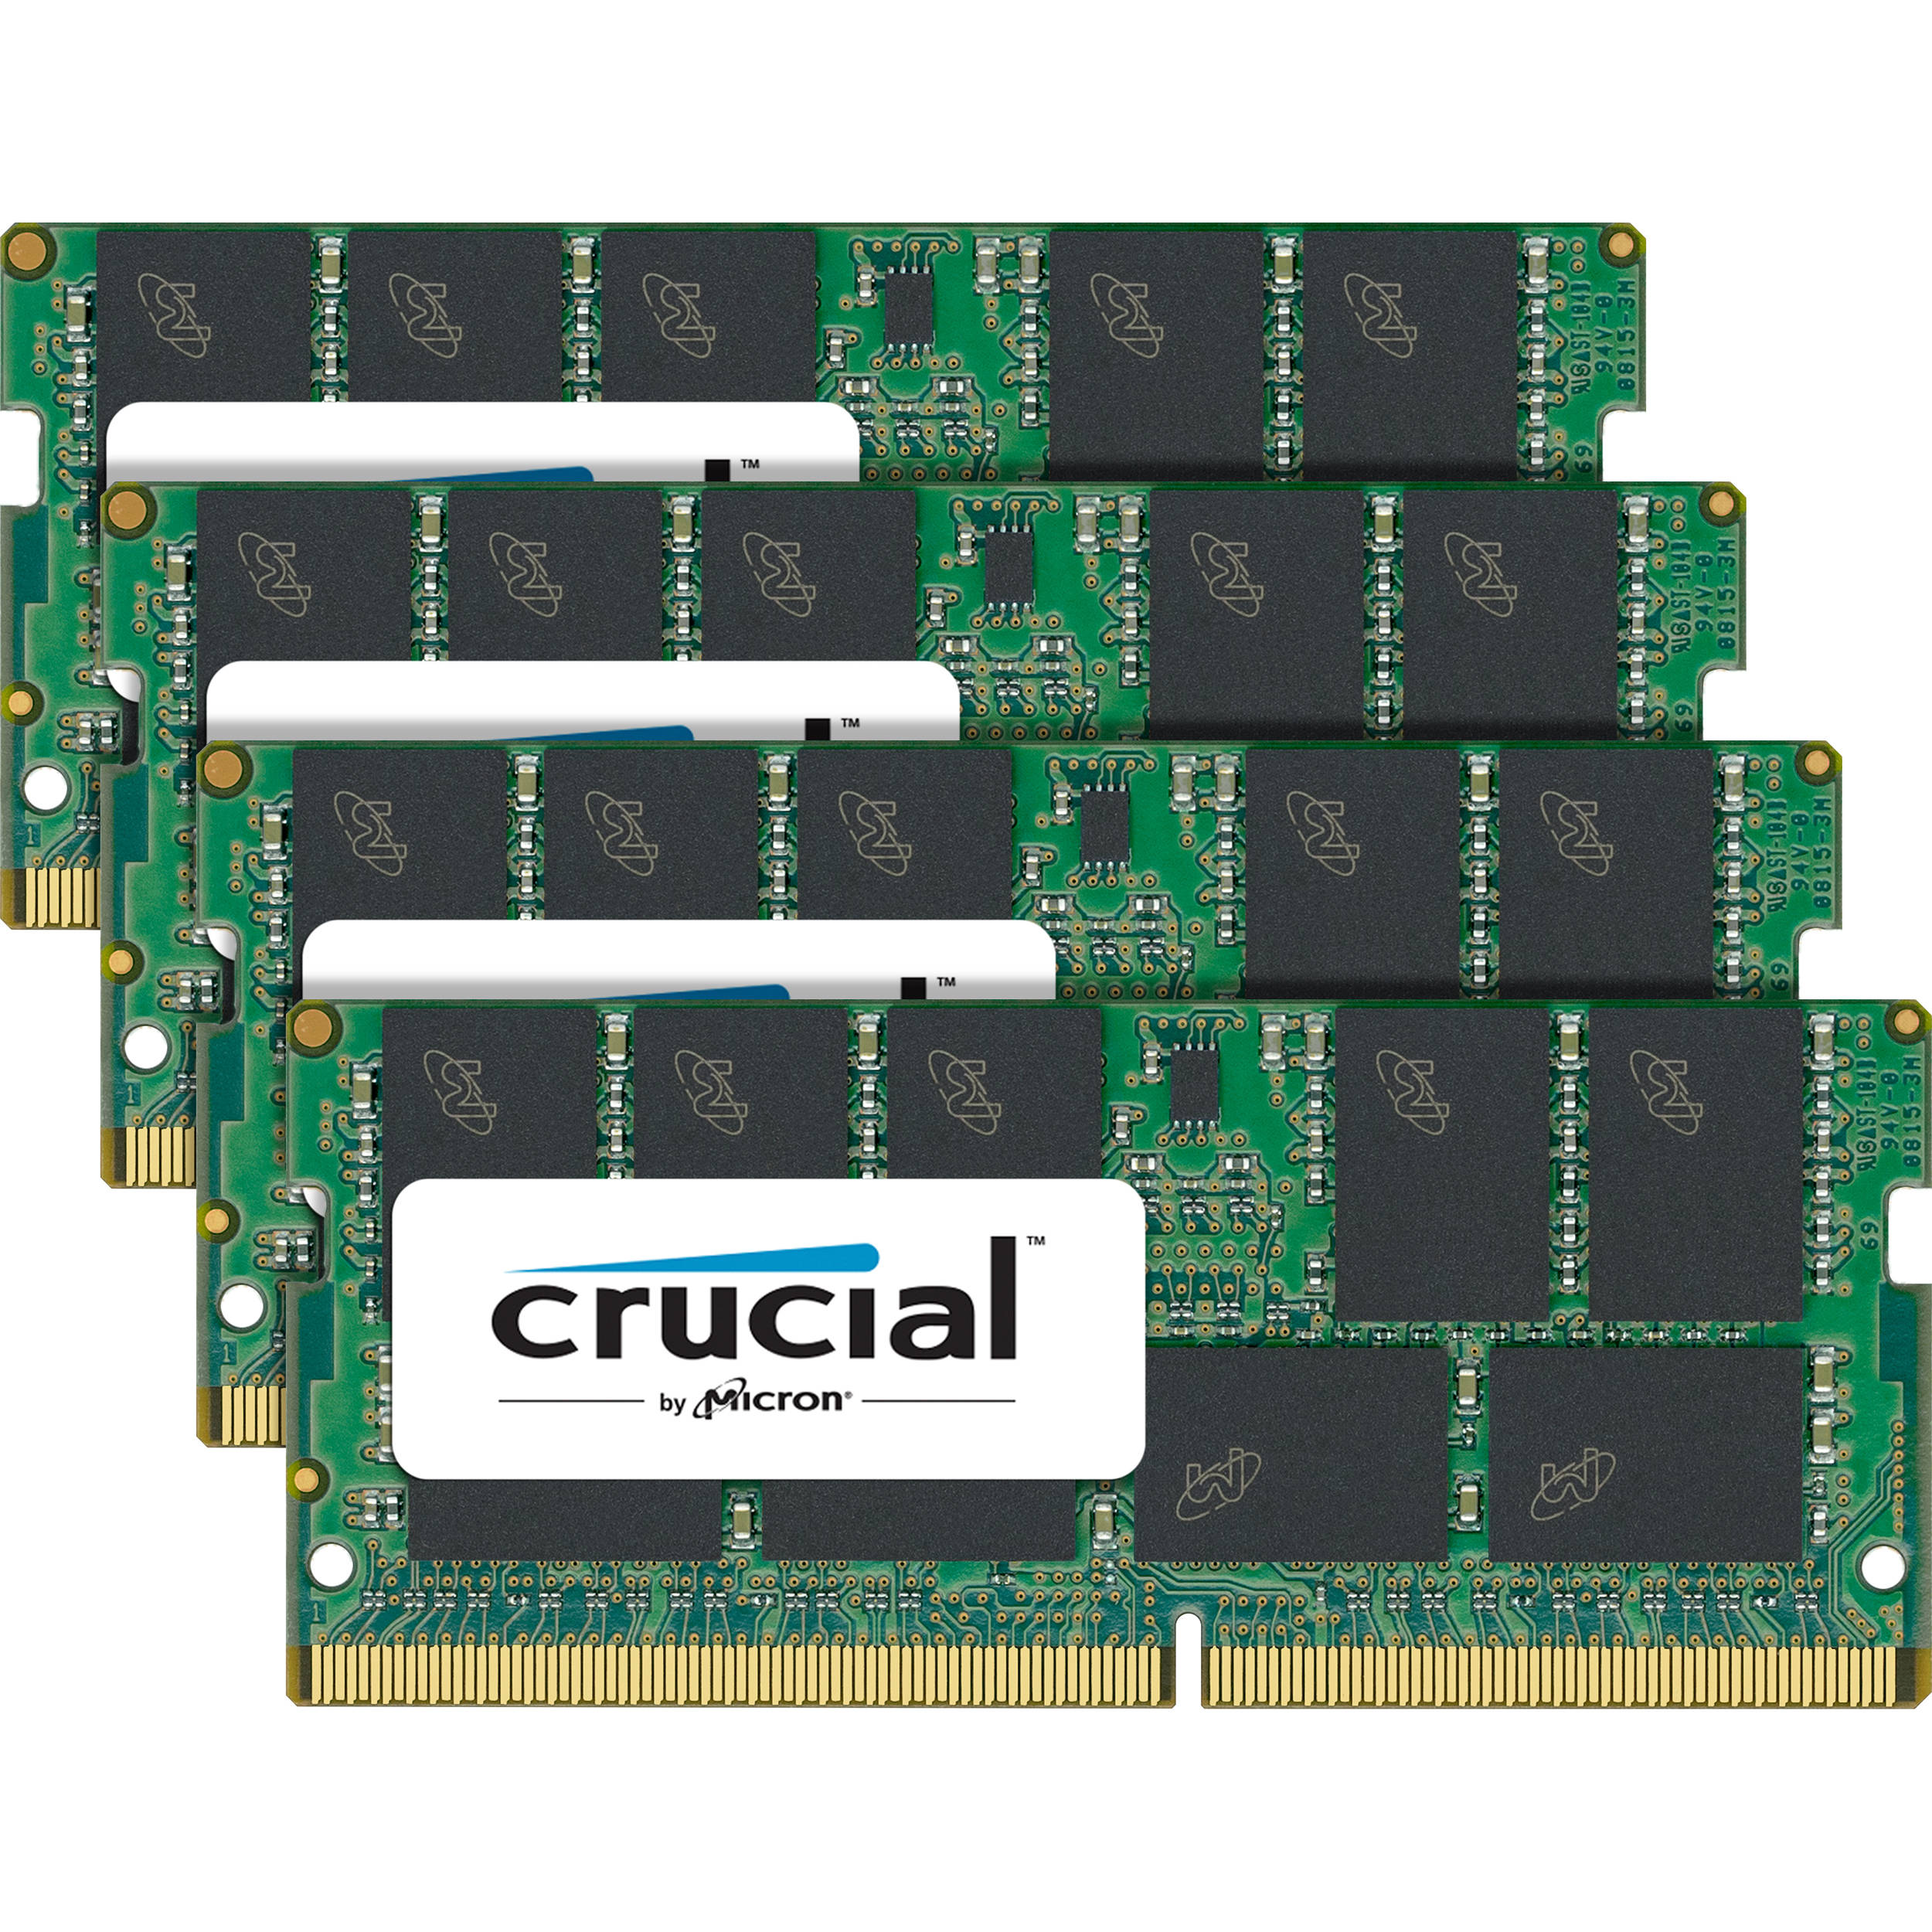 Crucial 64GB DDR4 2400 MHz SO-DIMM Memory Kit (4 x 16GB)